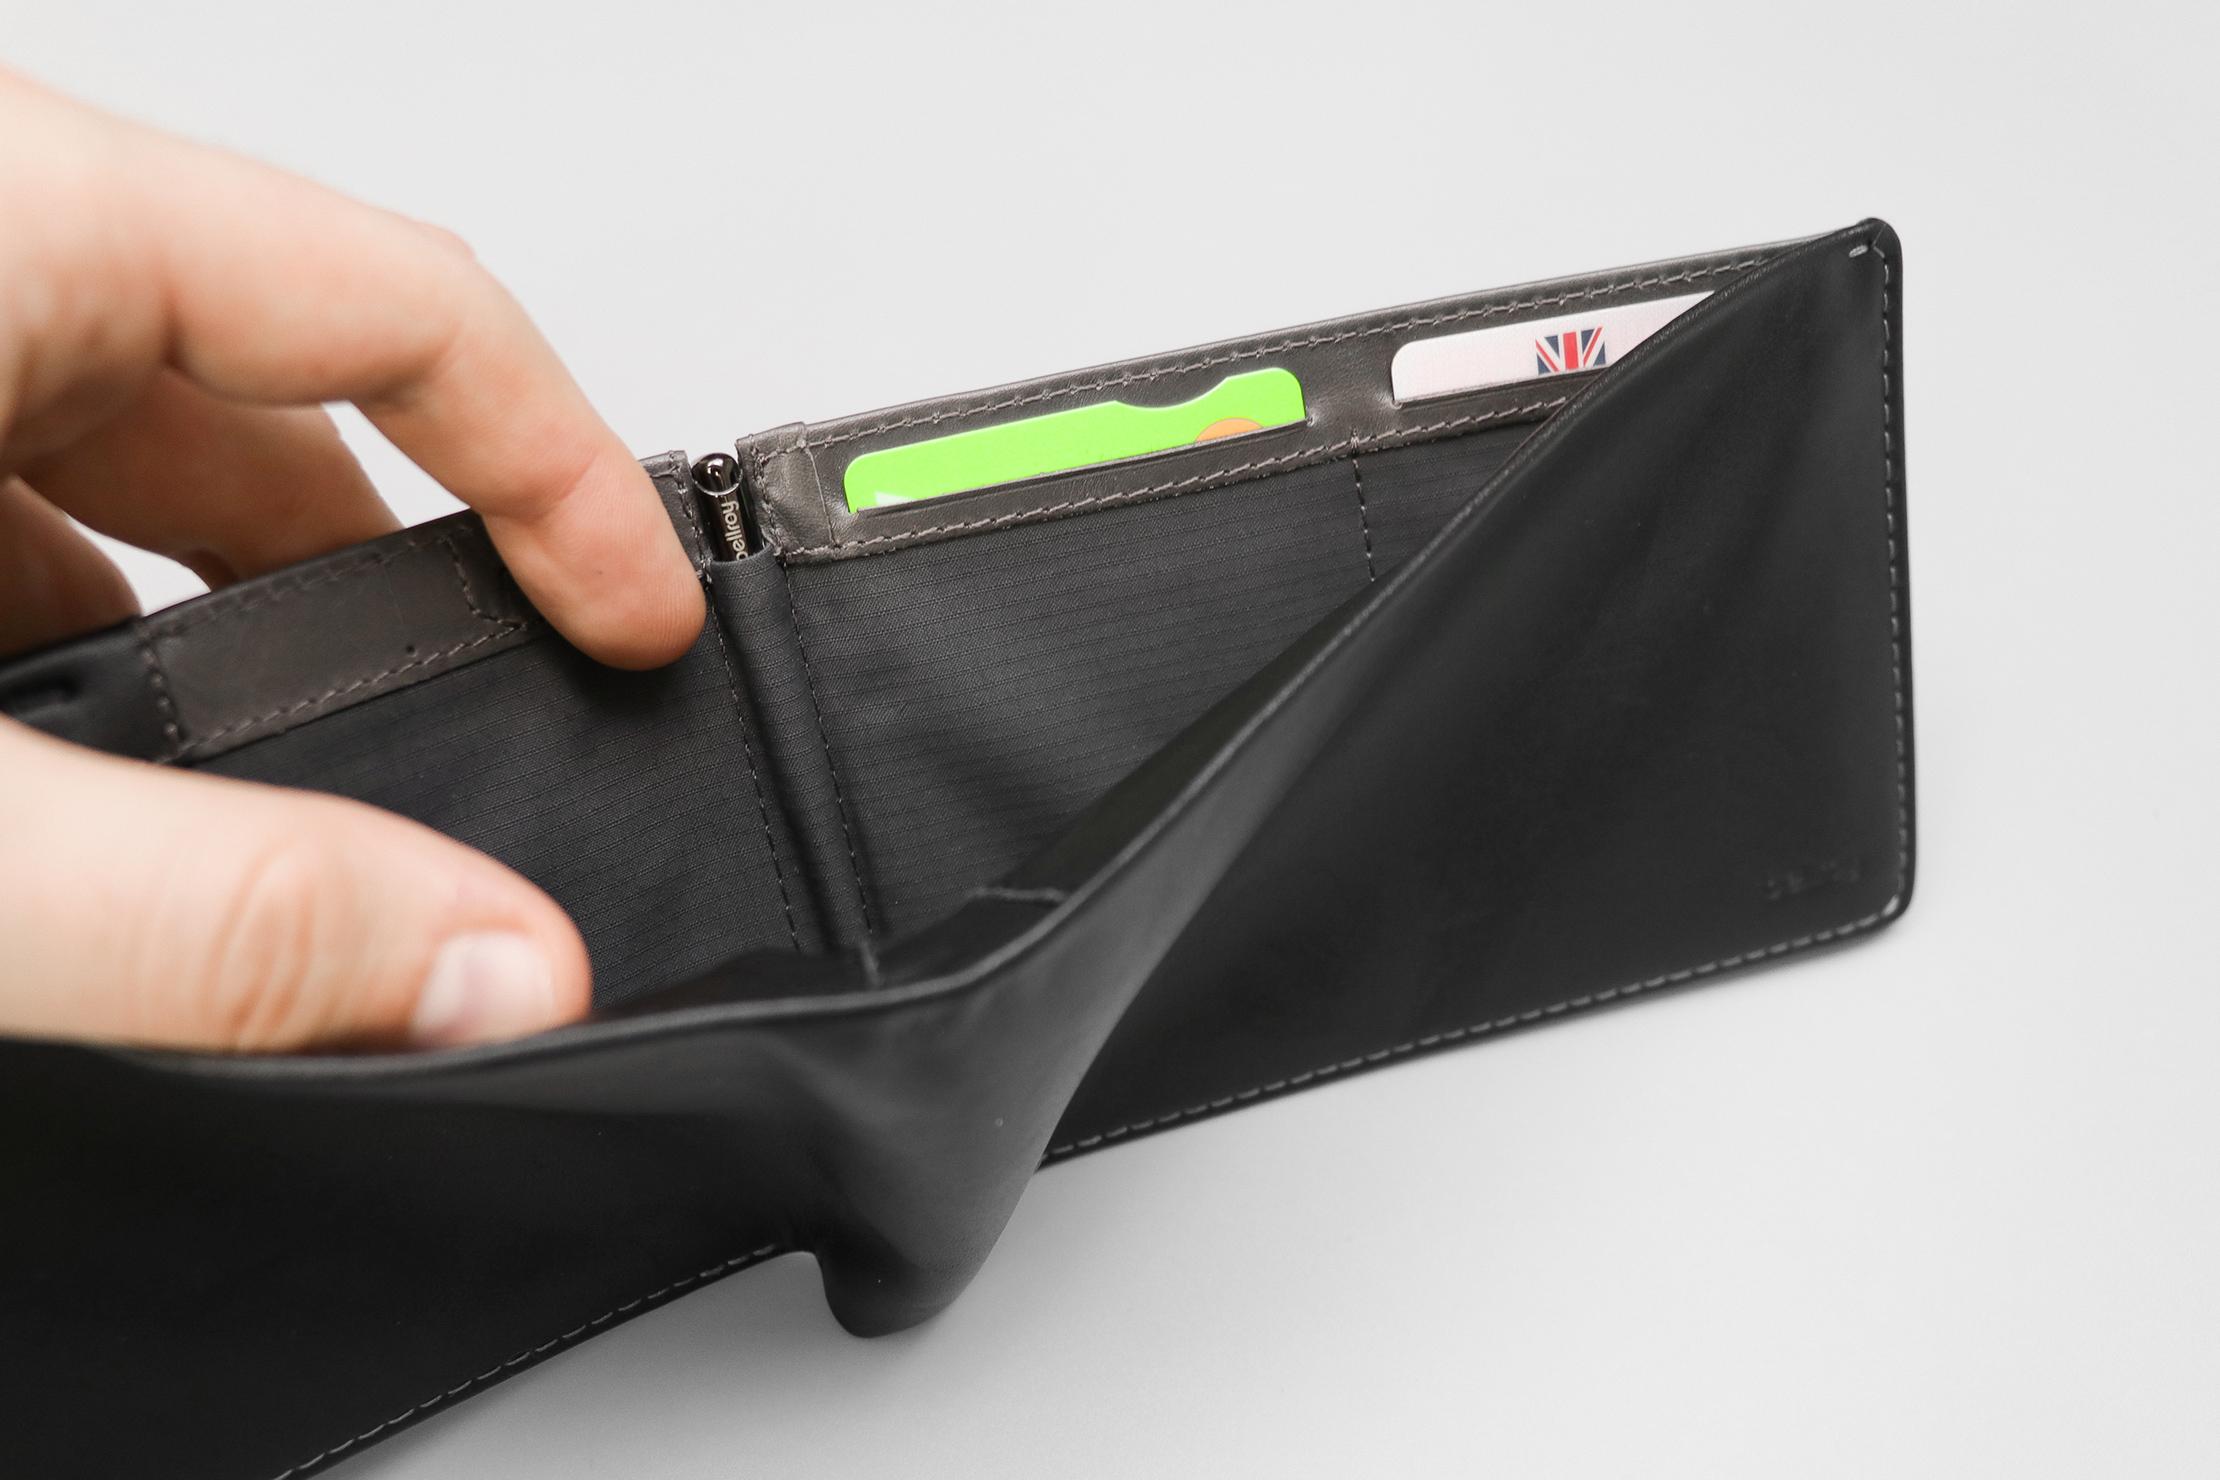 Bellroy Travel Wallet Back Card Sleeves